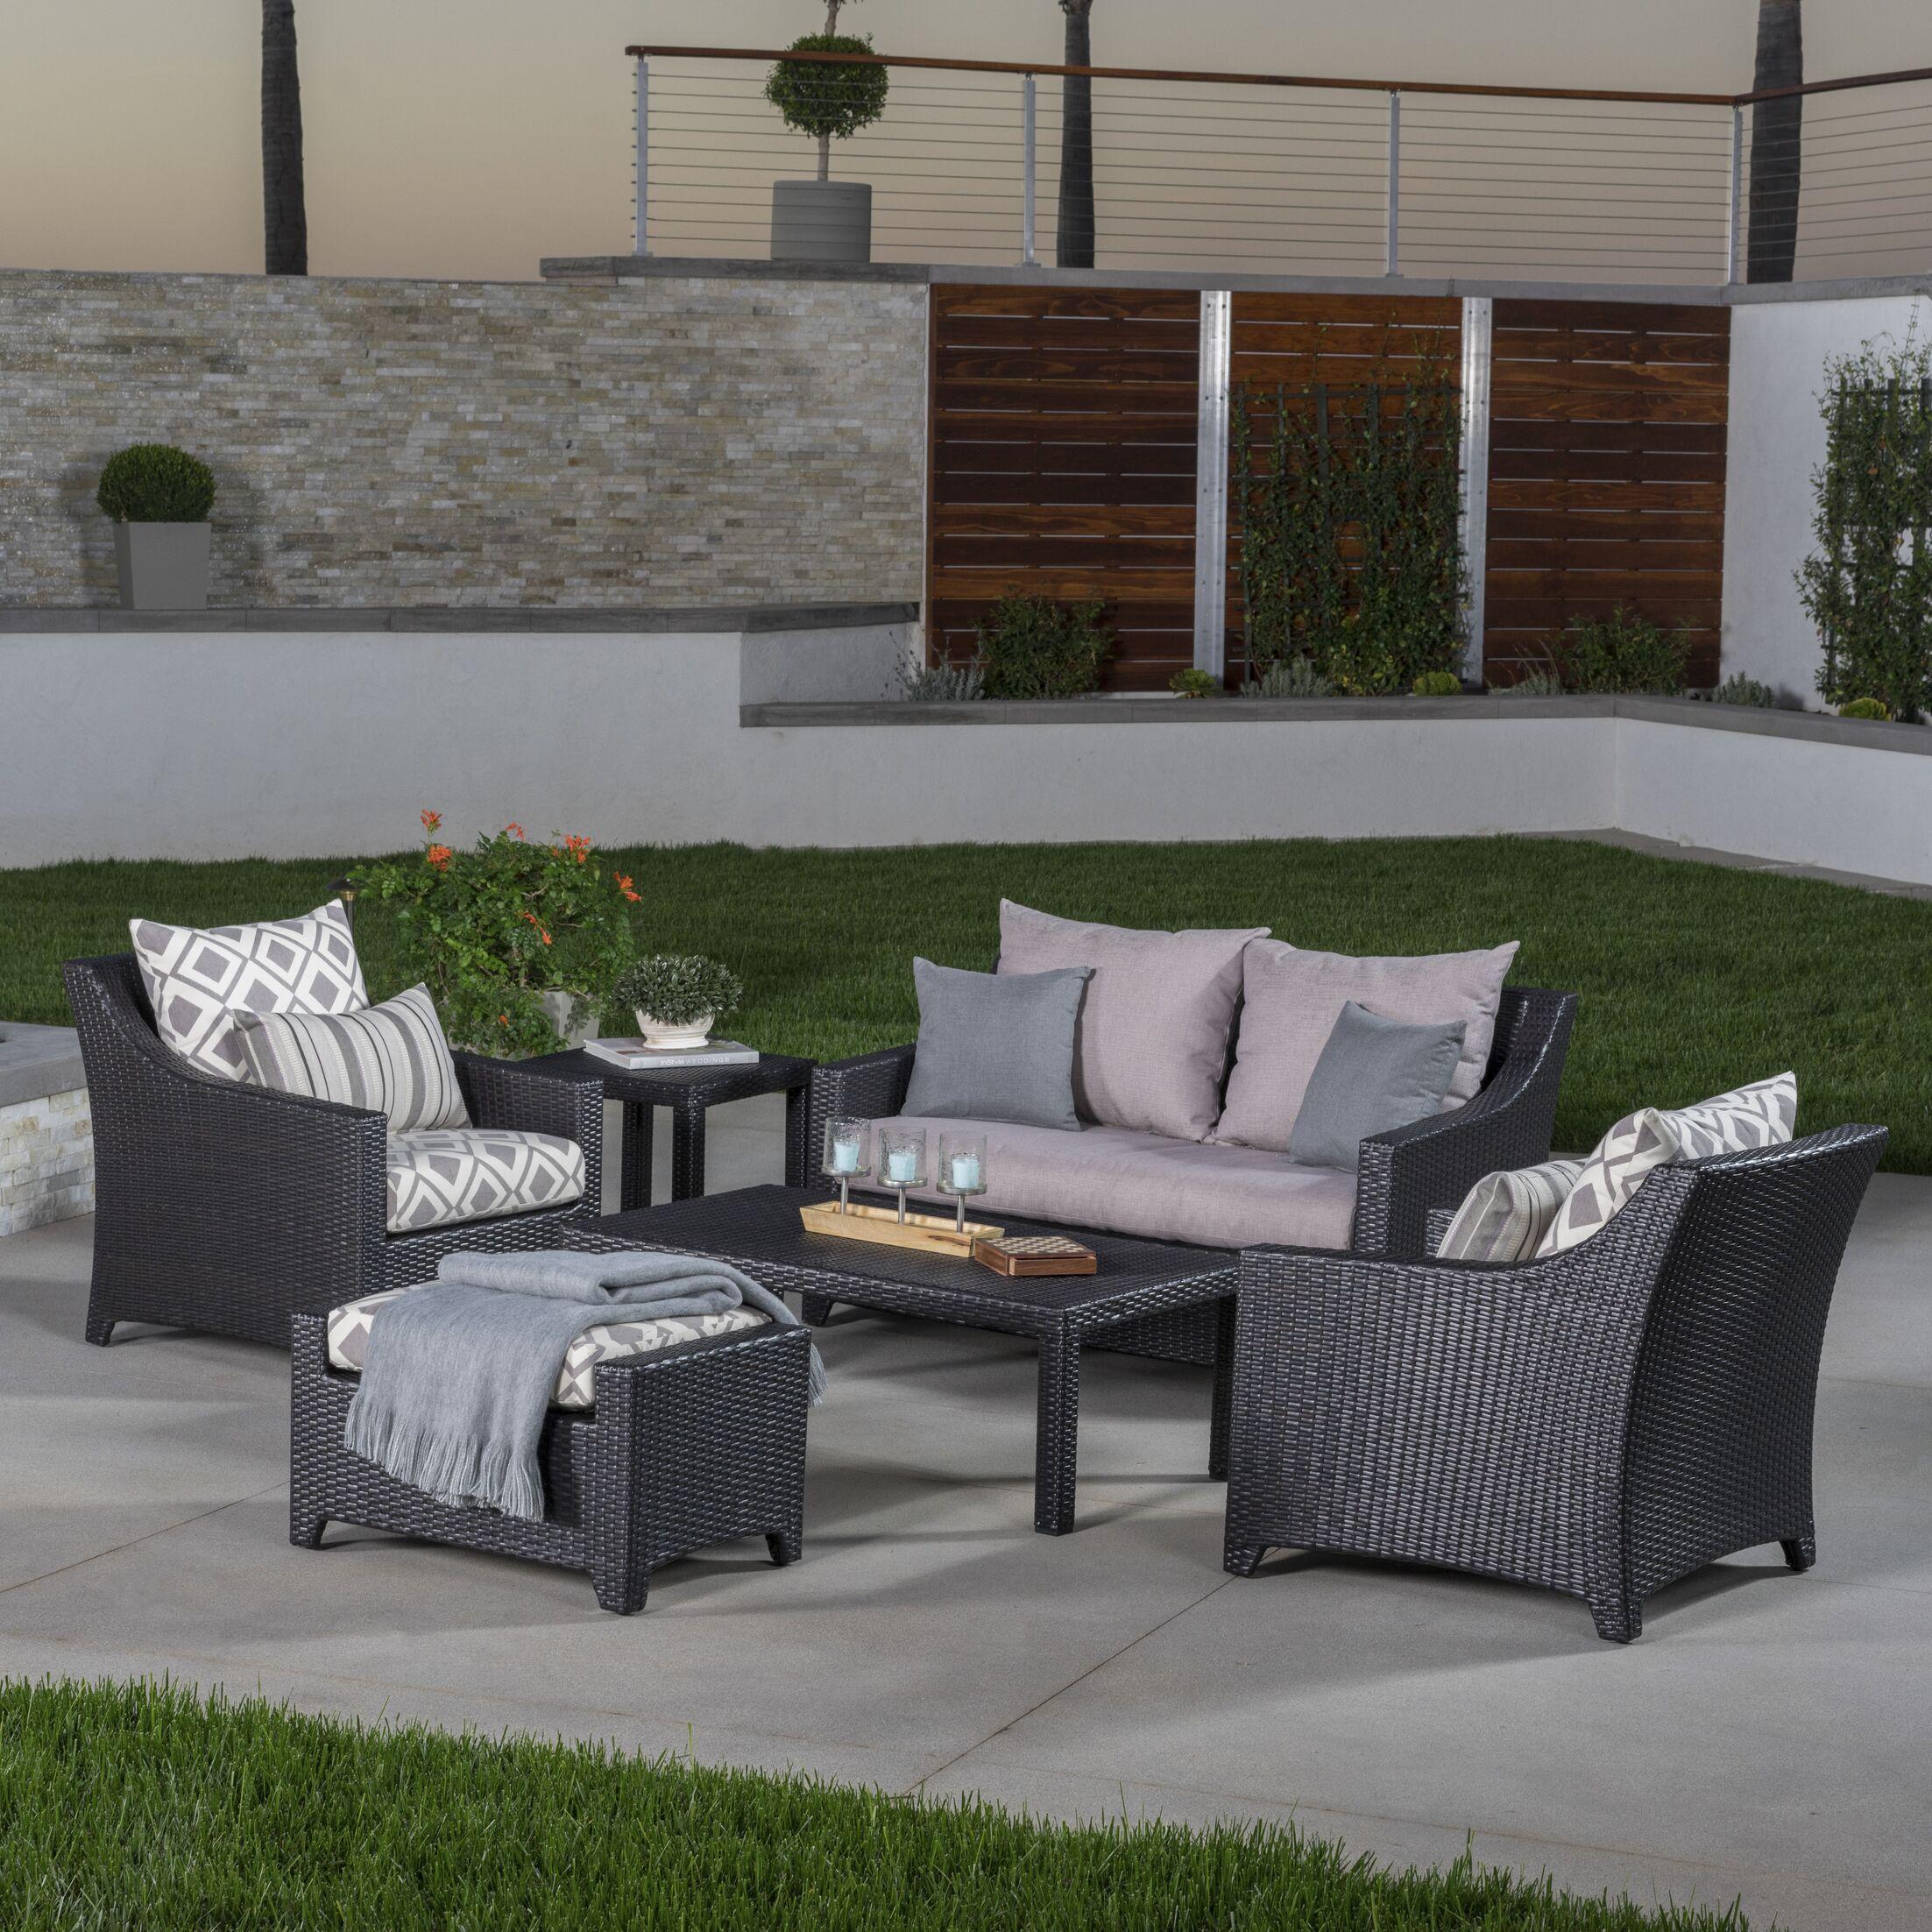 Northridge 6 Piece Rattan Sunbrella Sofa Set with Cushions Fabric: Wisteria Lavender